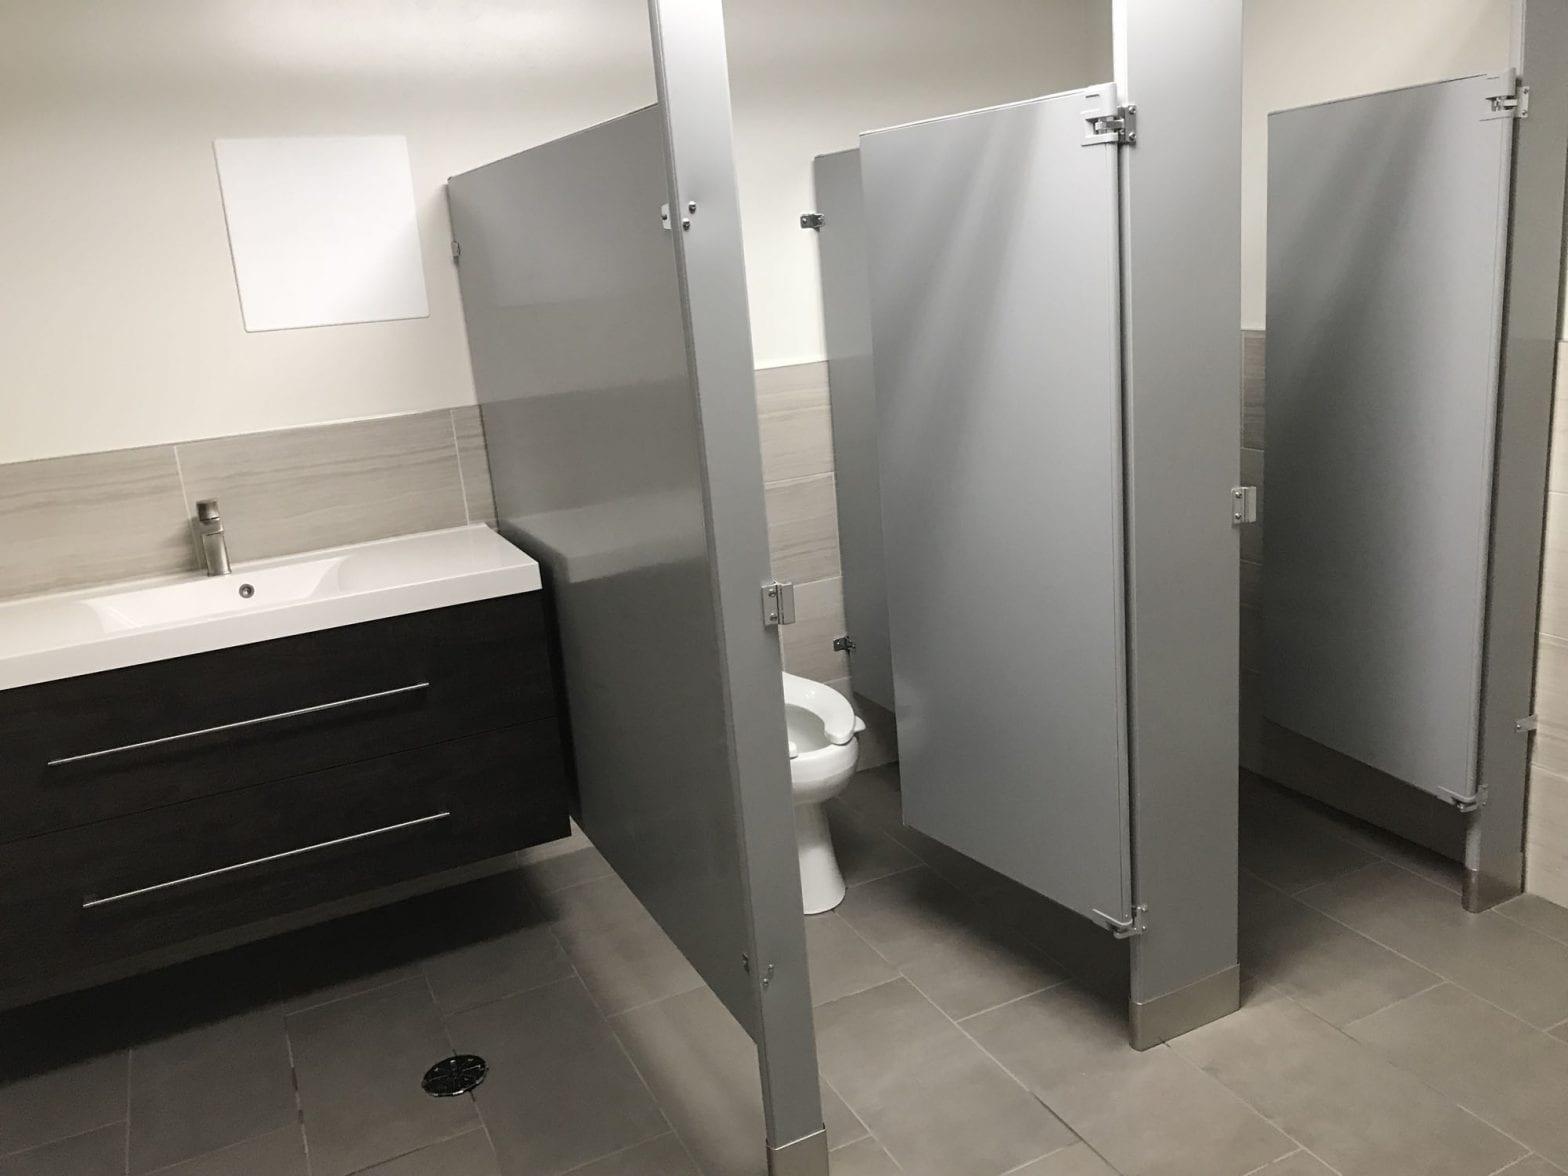 Commercial Property Bathroom remodeling in Elk Grove Village